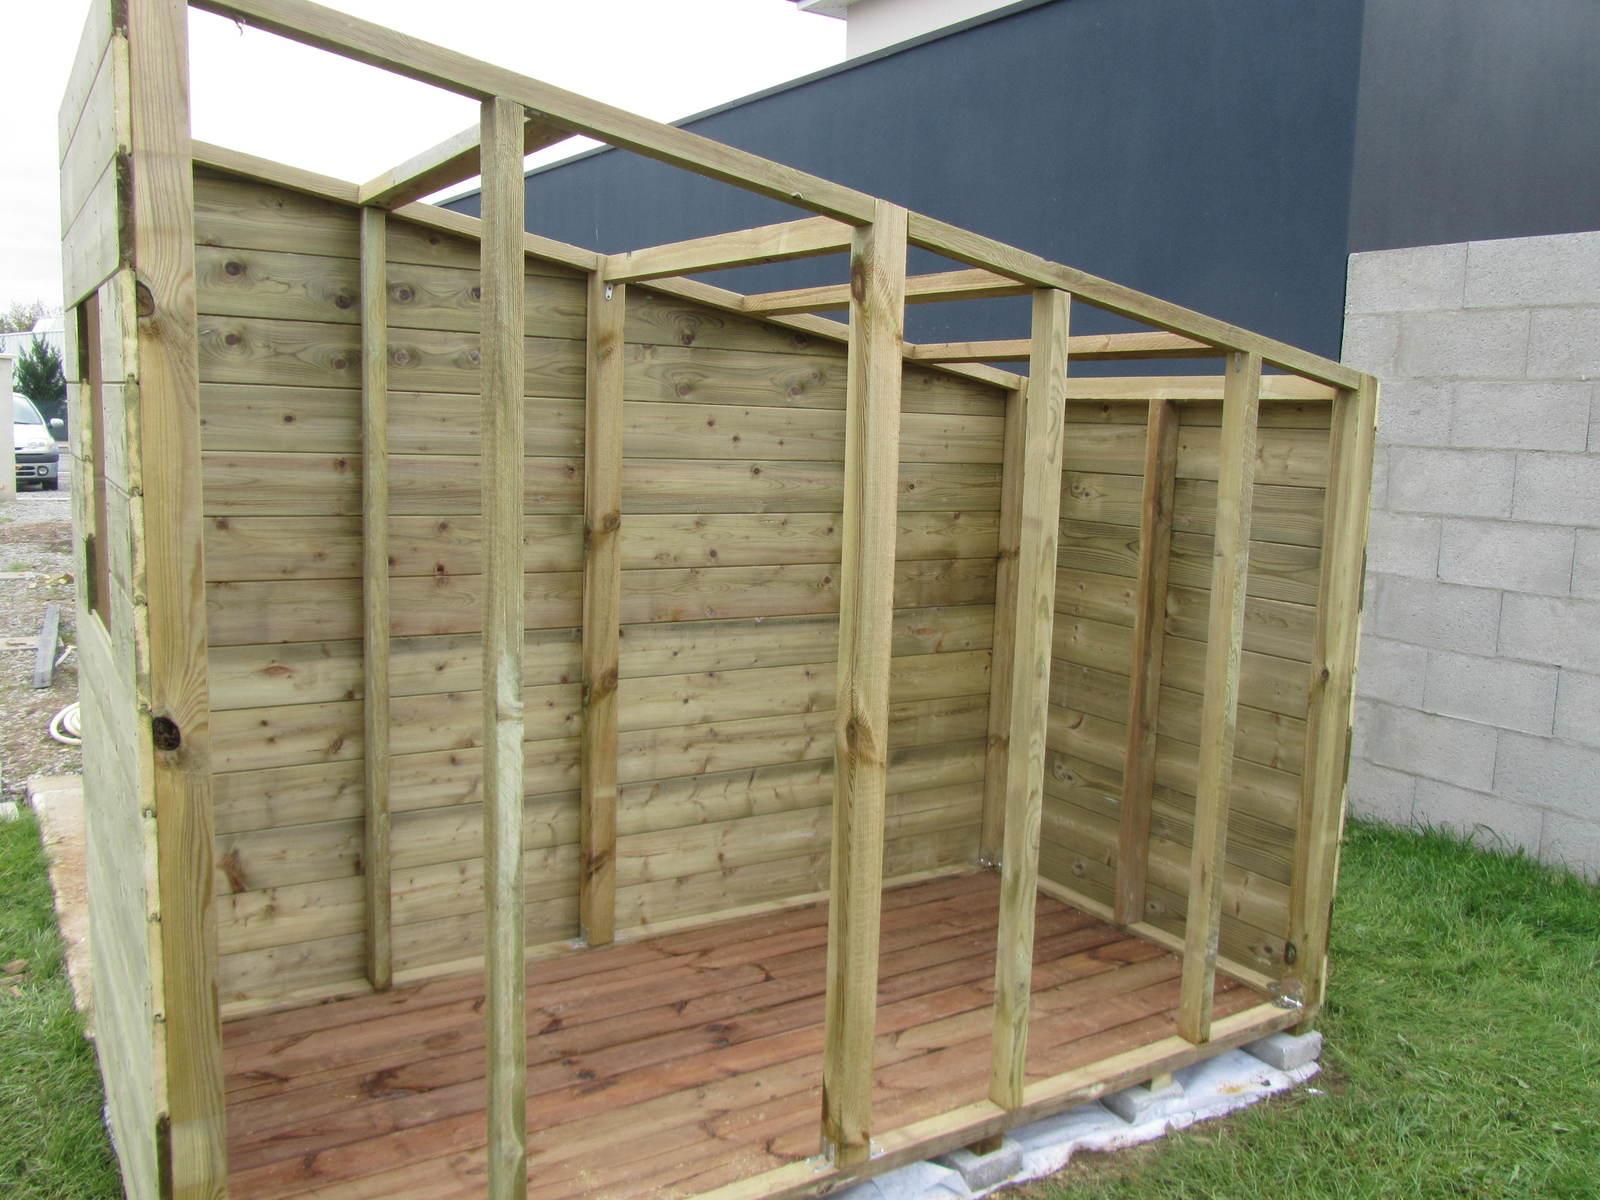 Construire Une Cabane De Jardin Concept - Idees Conception ... encequiconcerne Construire Une Cabane De Jardin